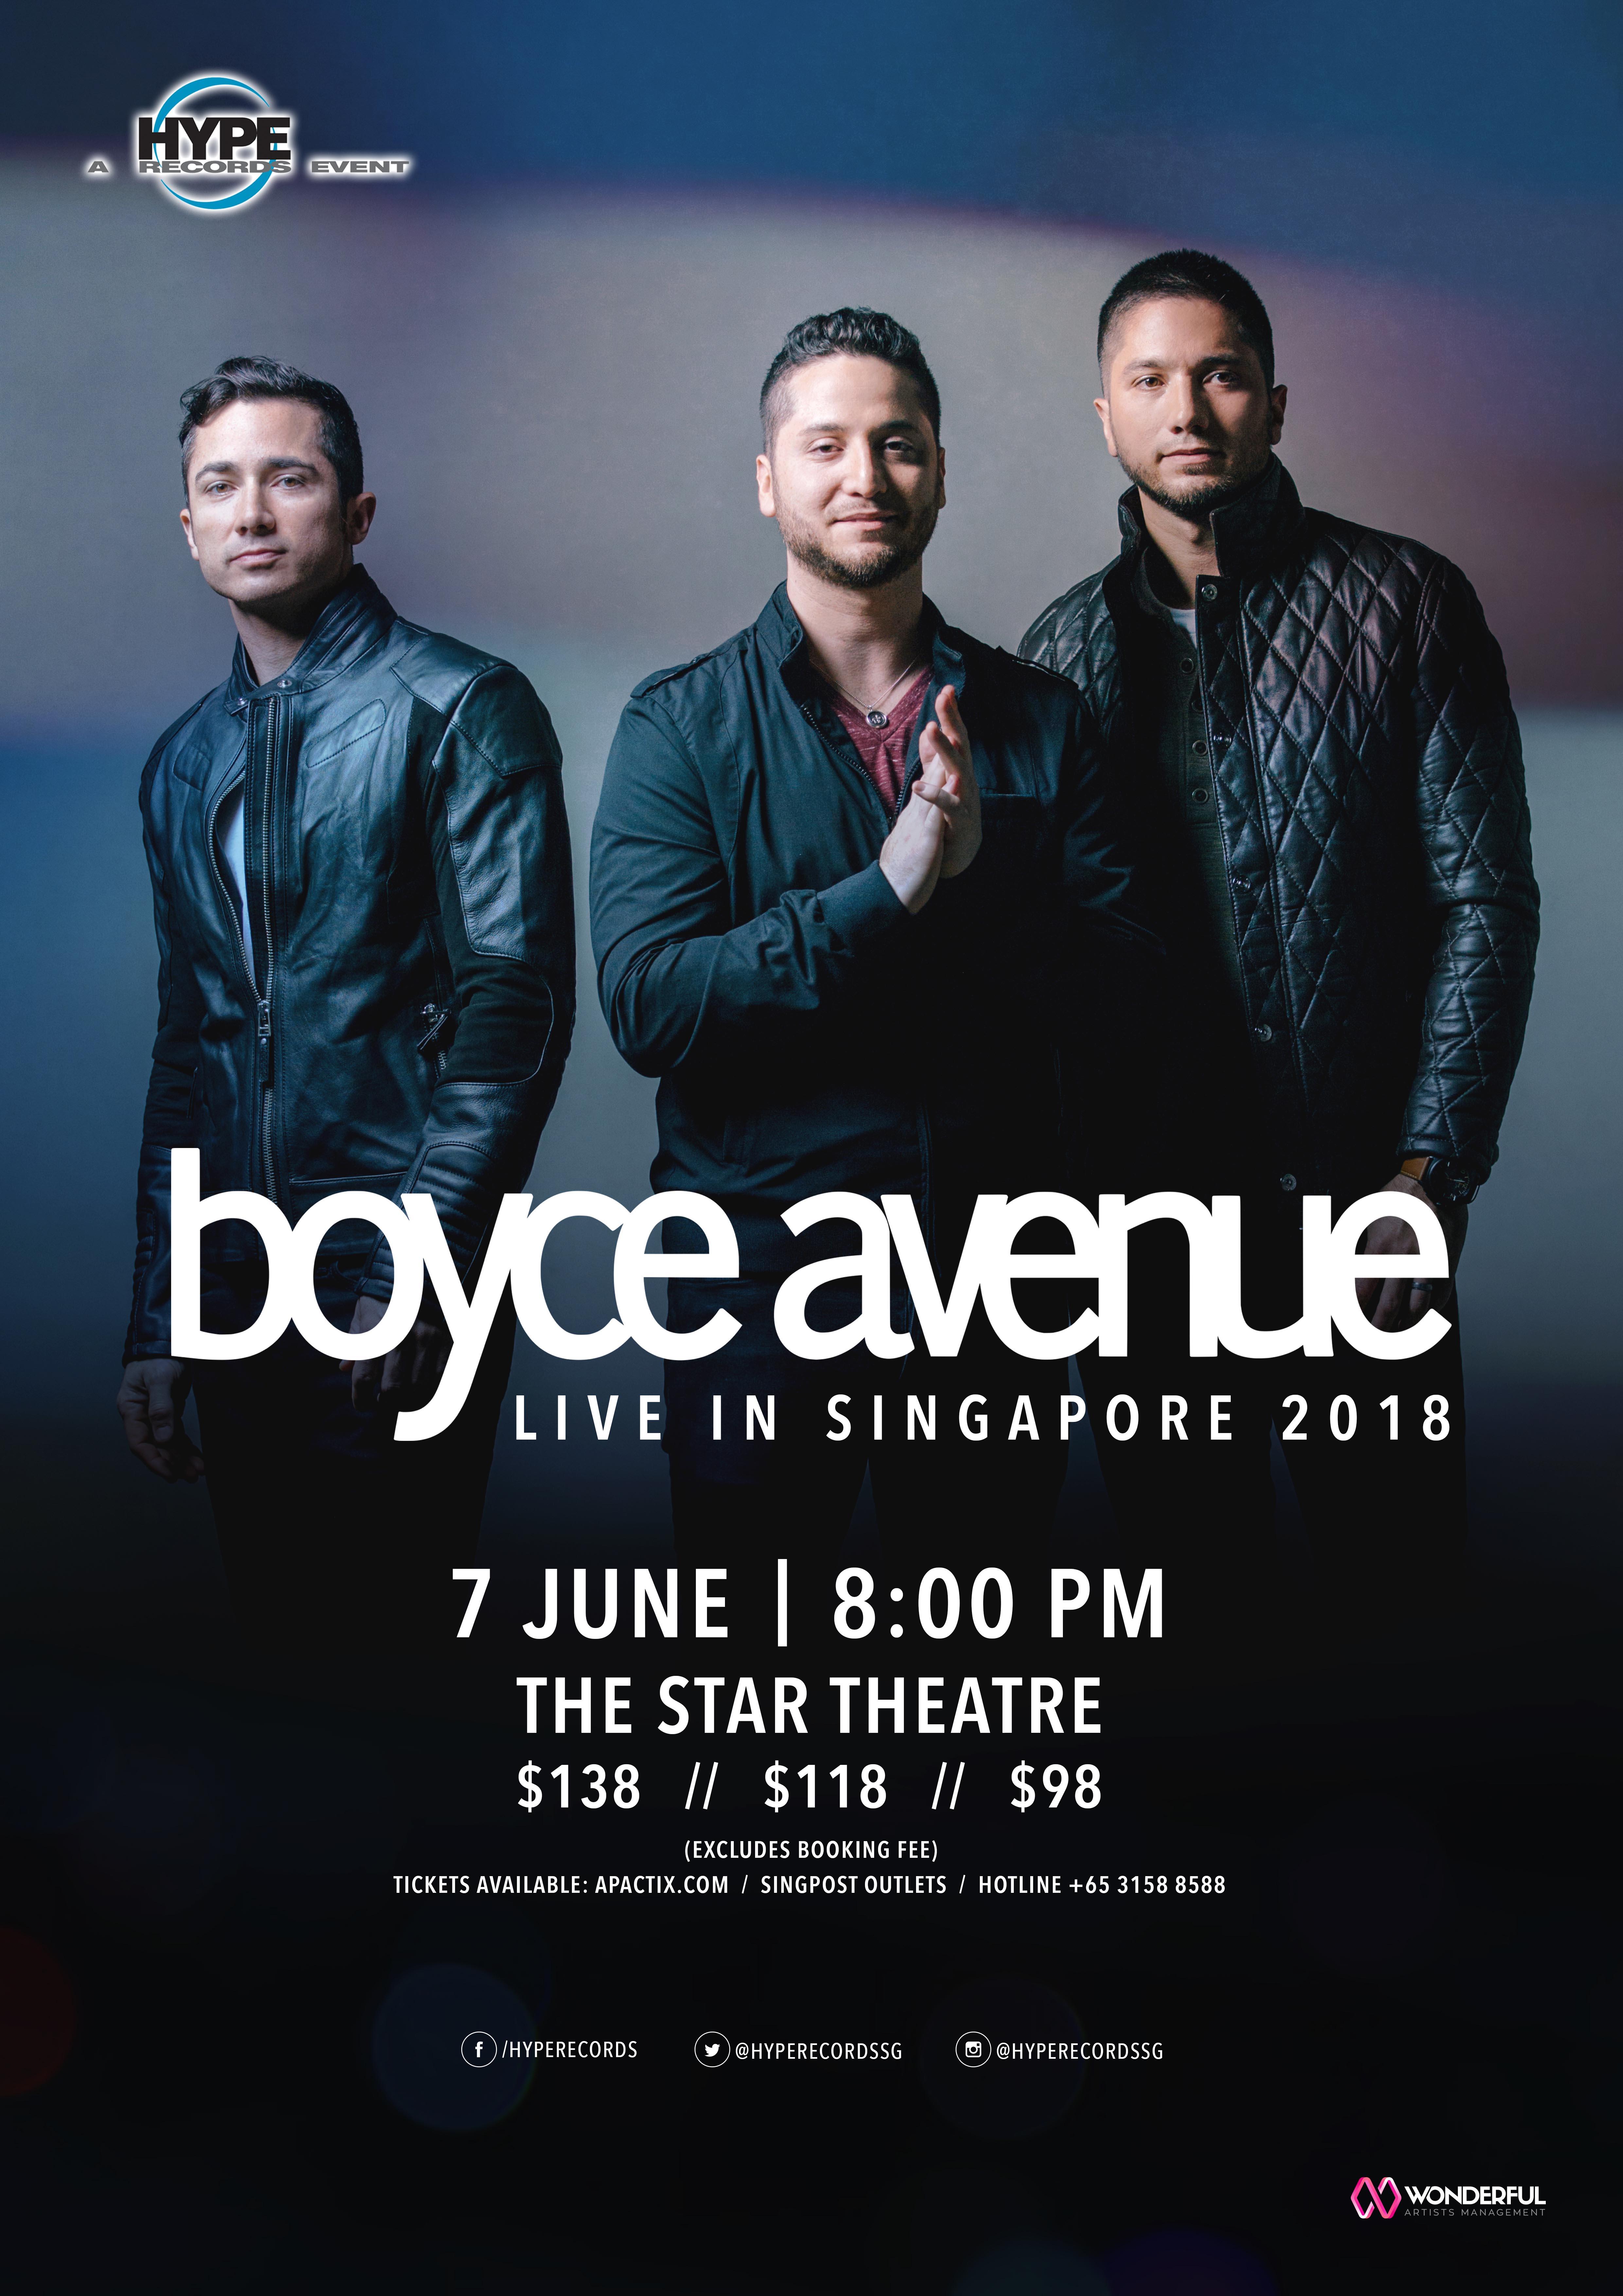 Boyce Avenue Live in Singapore 2018